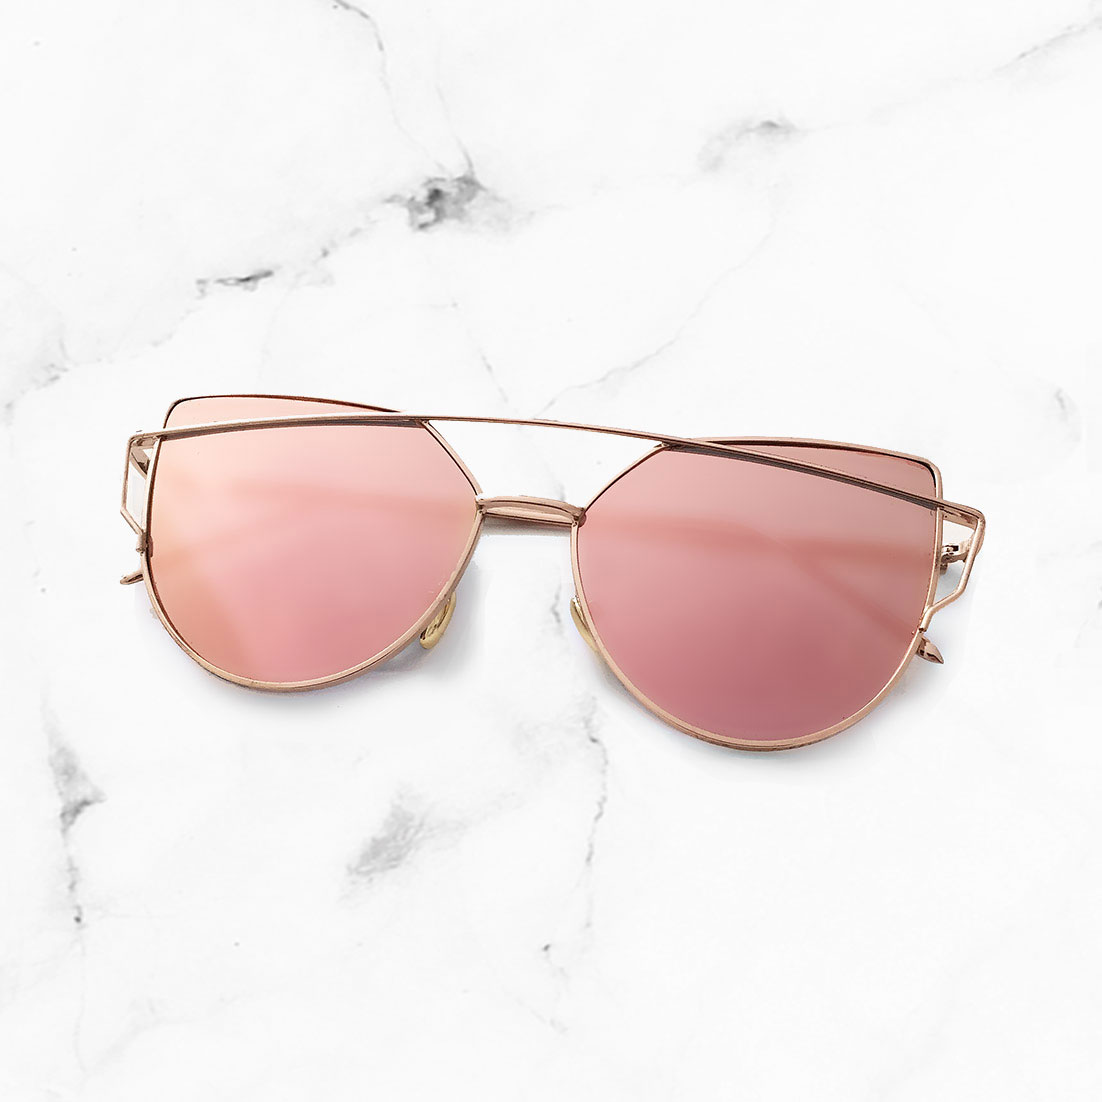 Chloe Gold Frame Sunglasses : 01RoseGold